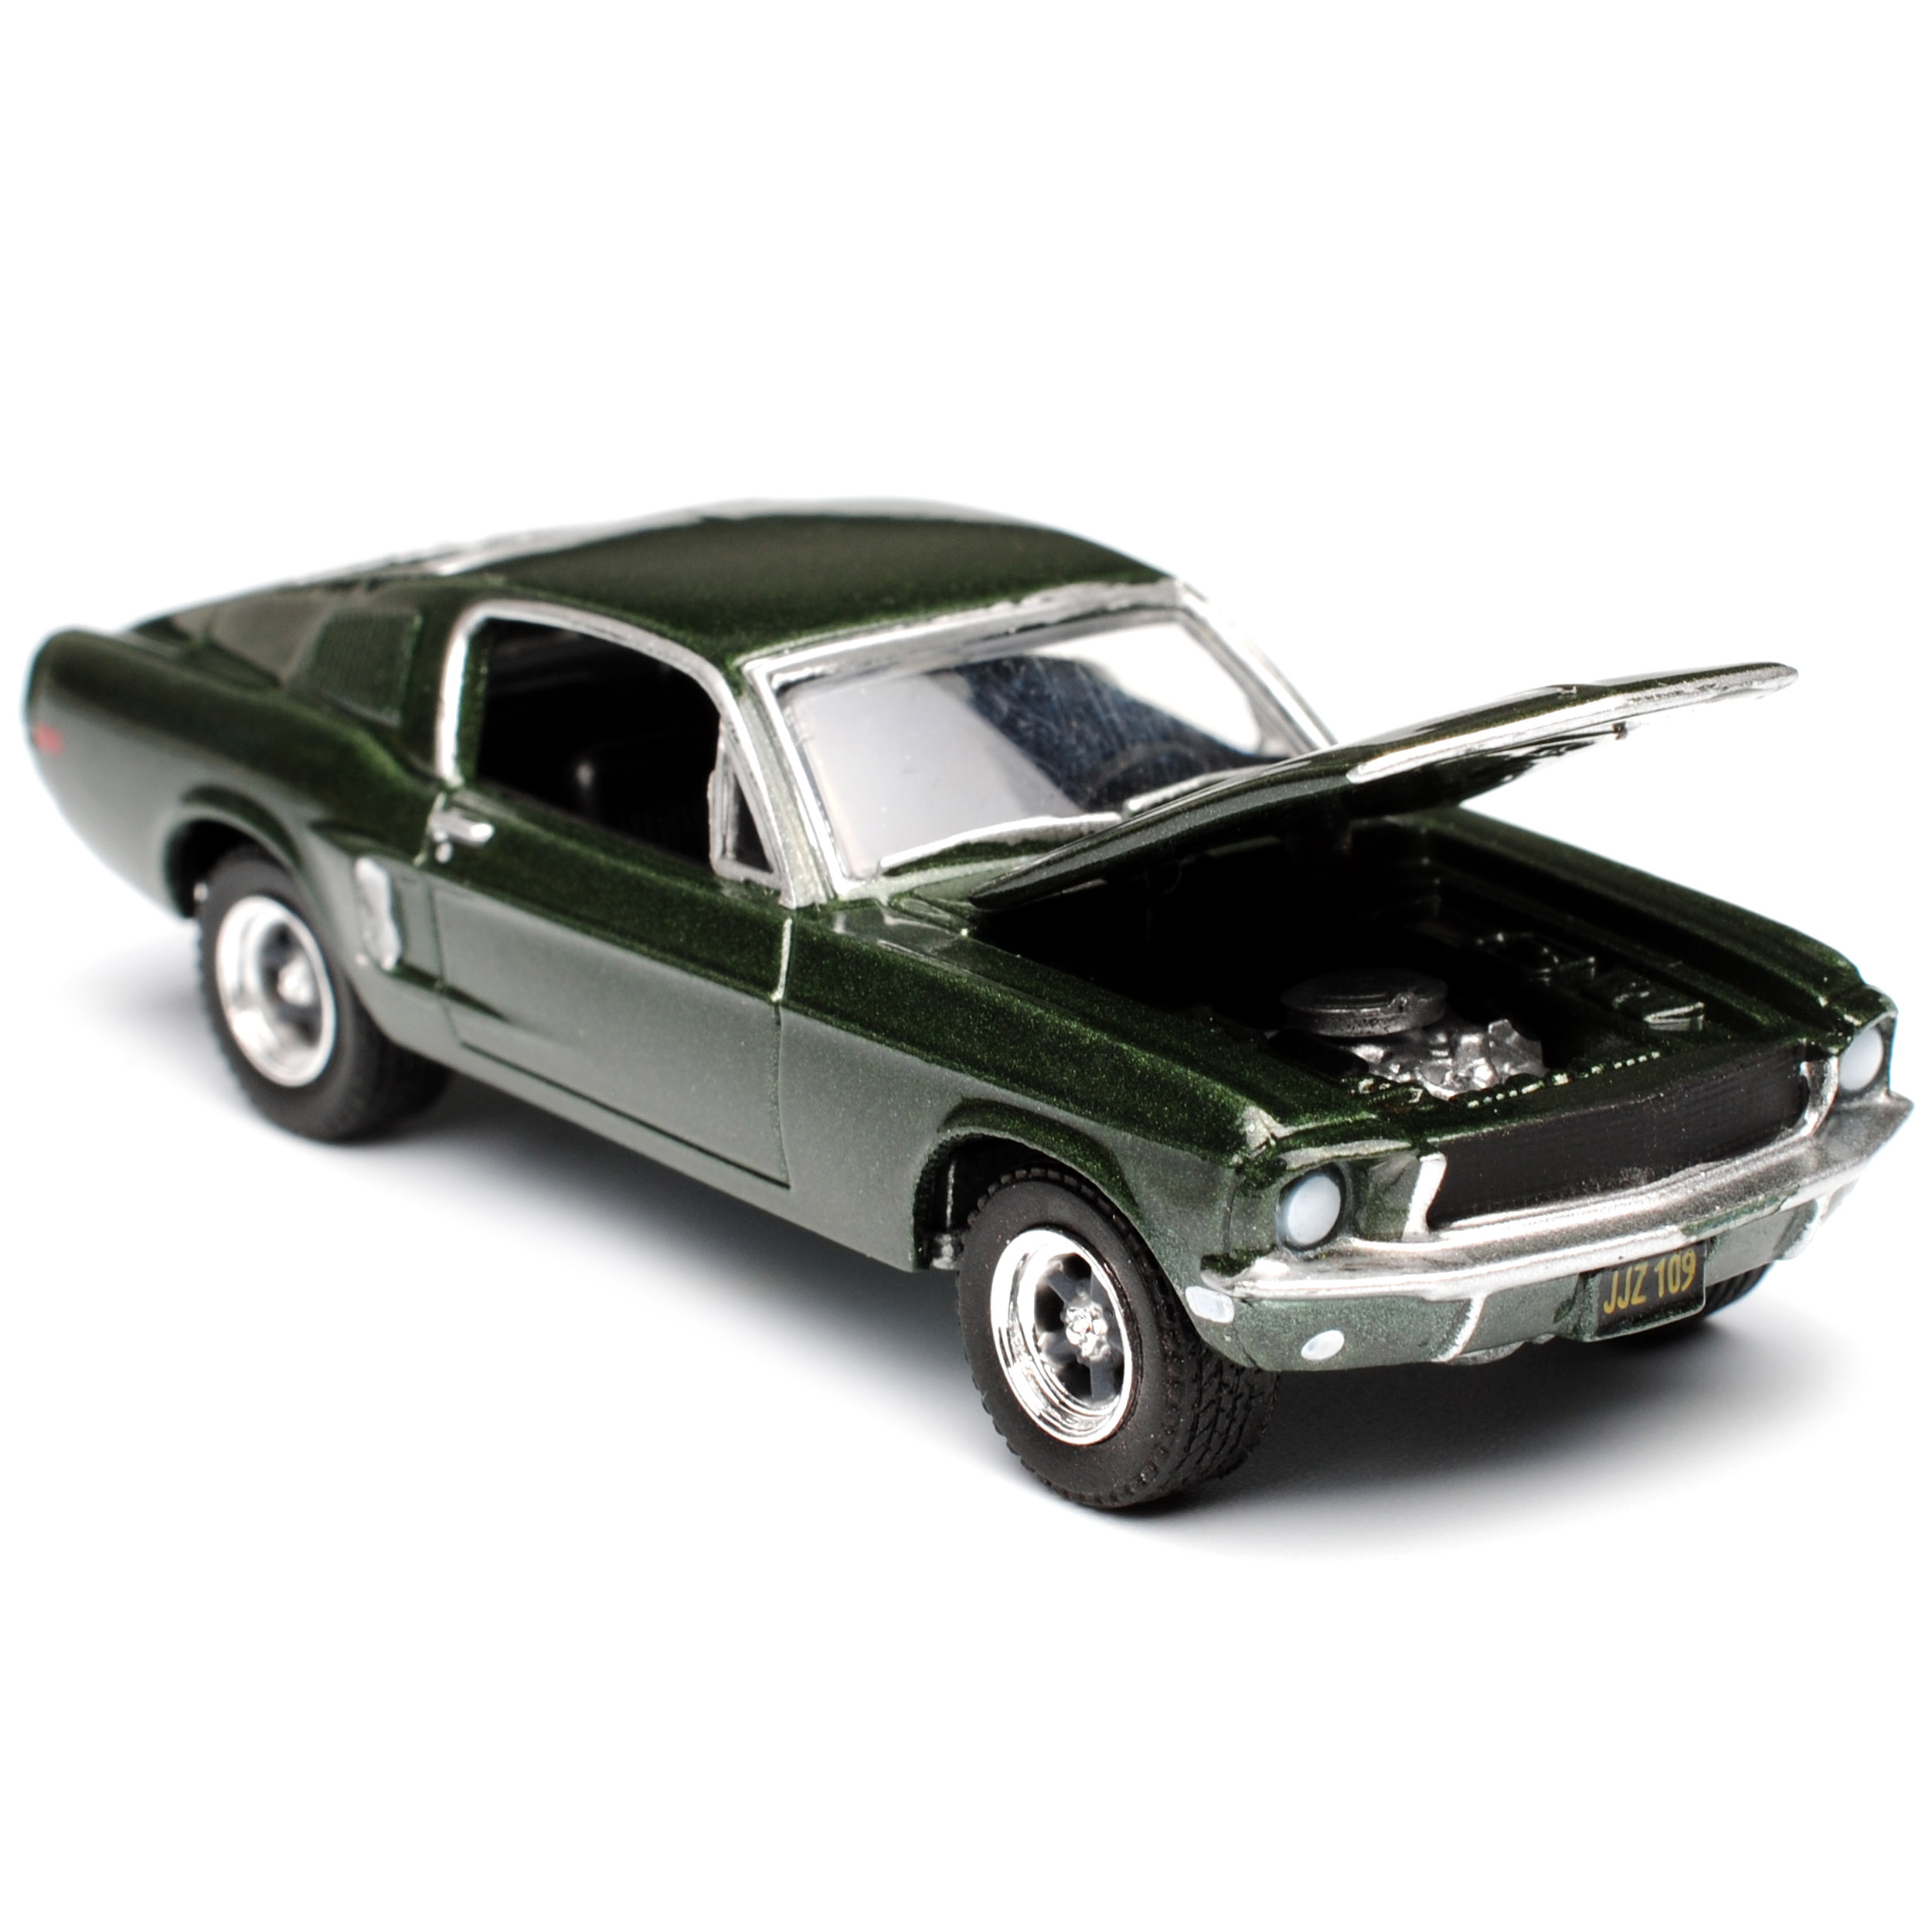 Ford Mustang Bullitt green Coupe in 1 1 1 64 mit Figur Steve McQueen in 1 18 Greenl.. 525ea2